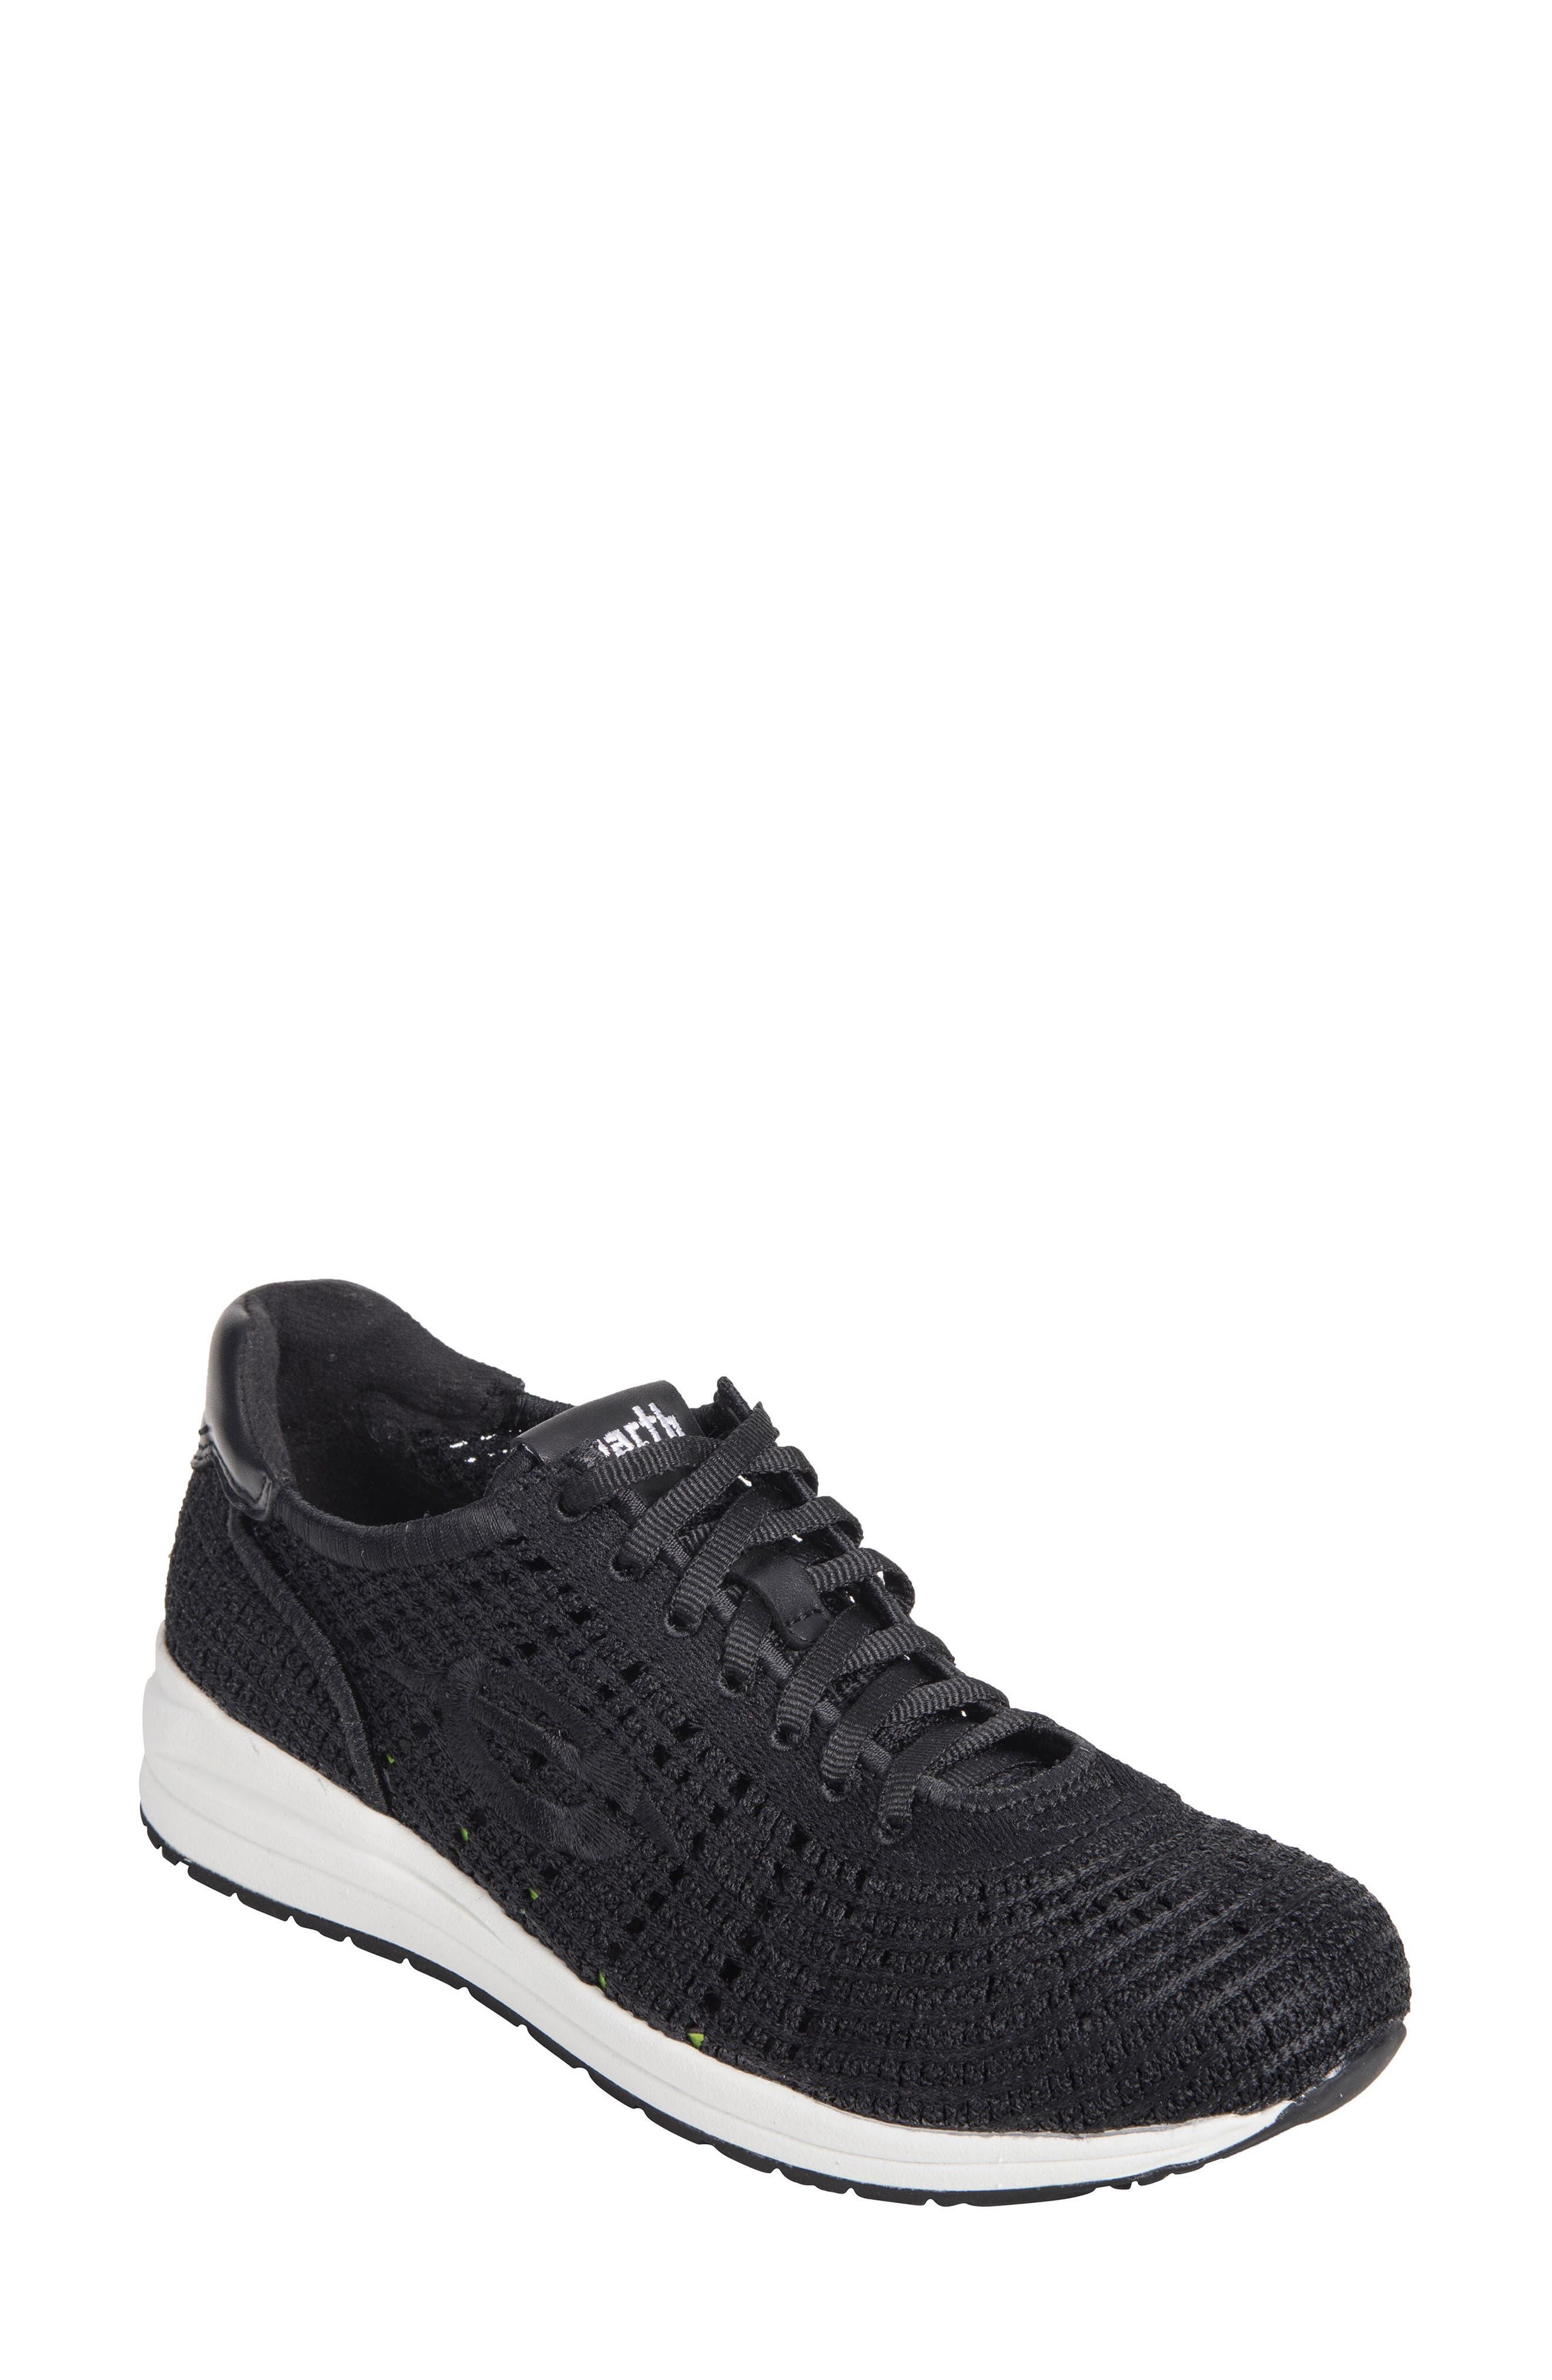 Earth Vital Sneaker,                             Main thumbnail 1, color,                             Black